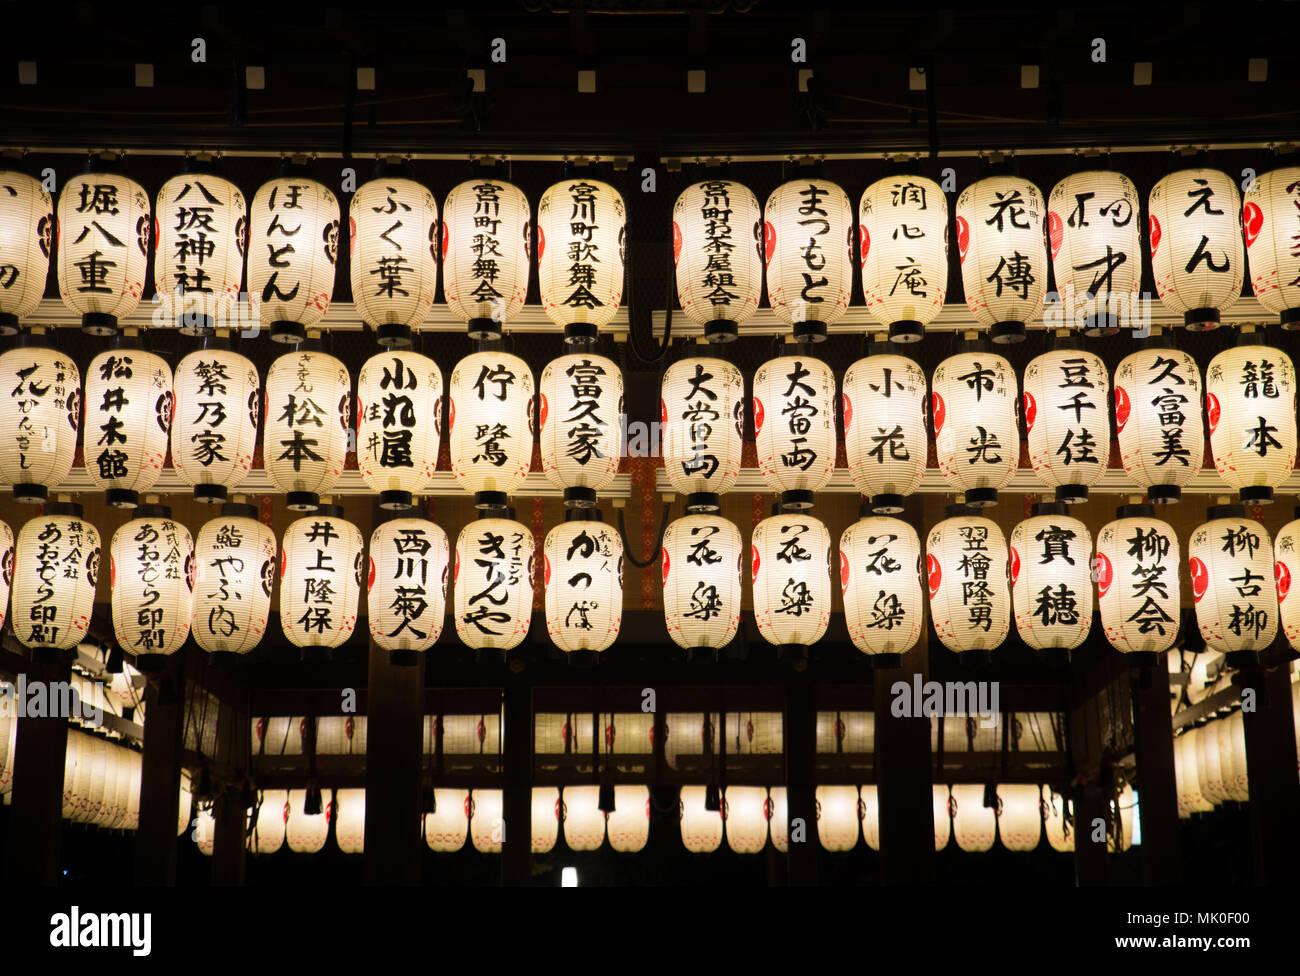 Japanese lanterns in Kyoto - Stock Image